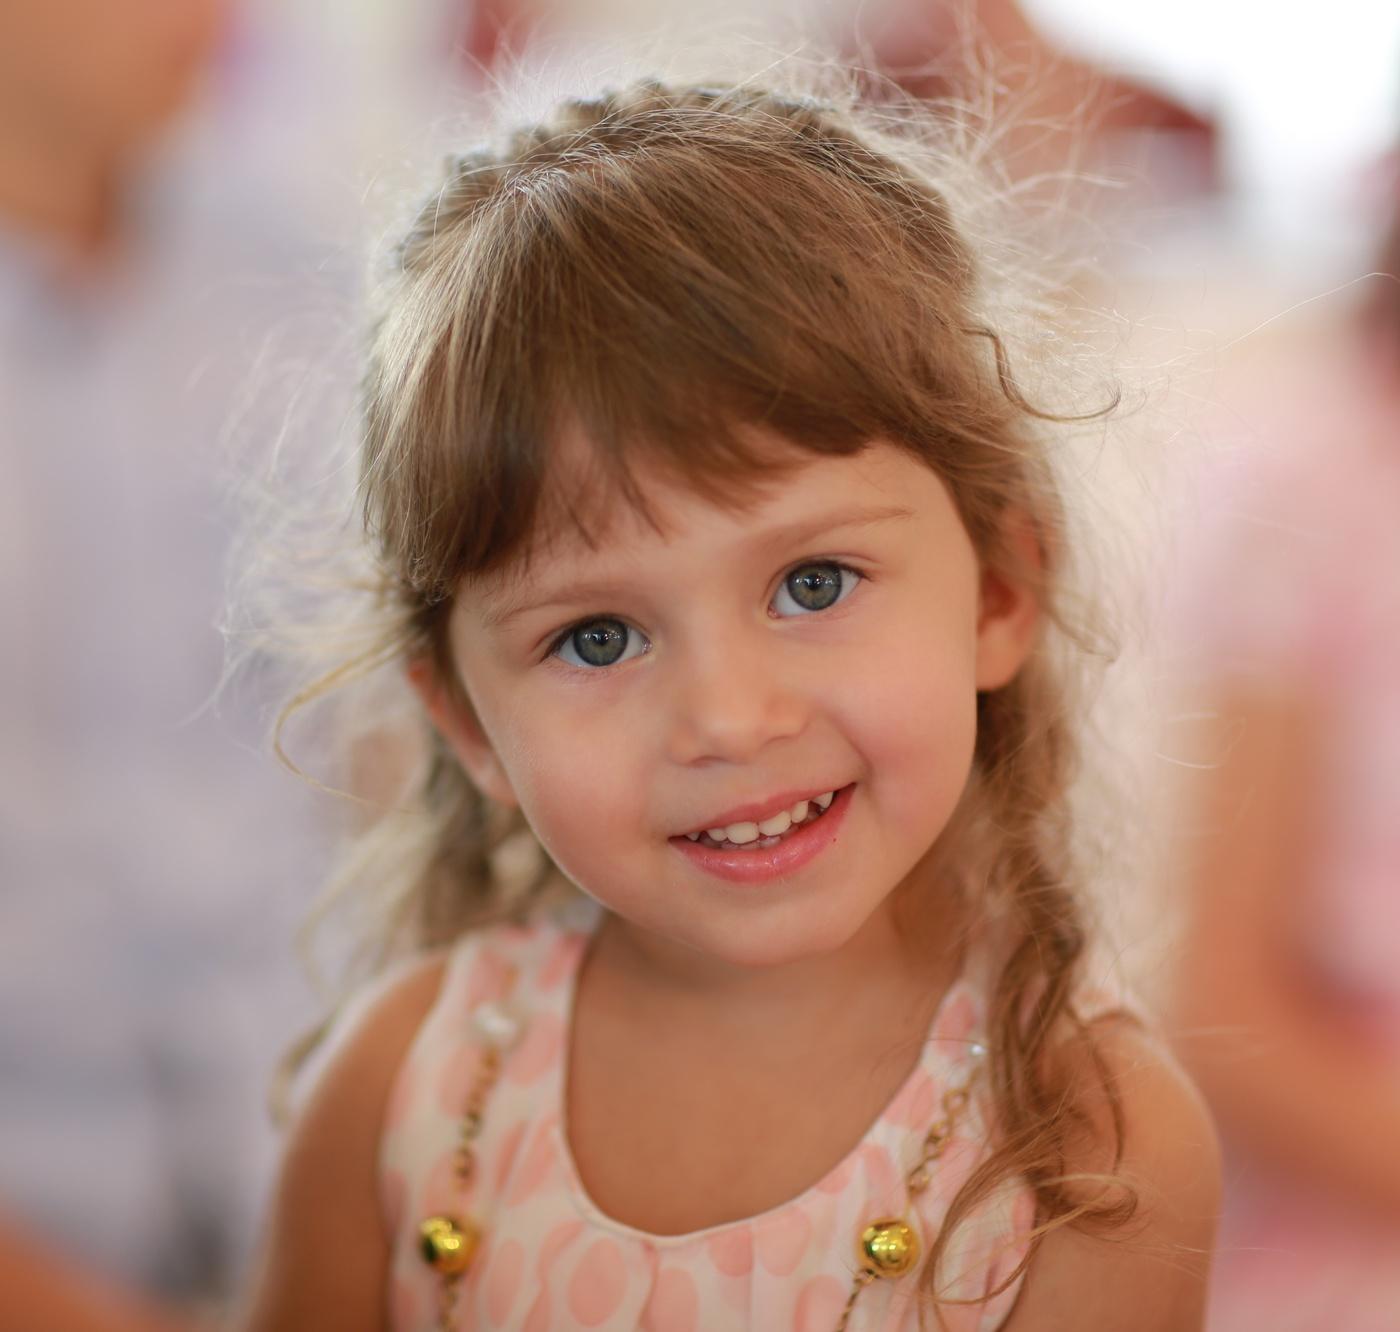 Девочка фото ребенок картинка